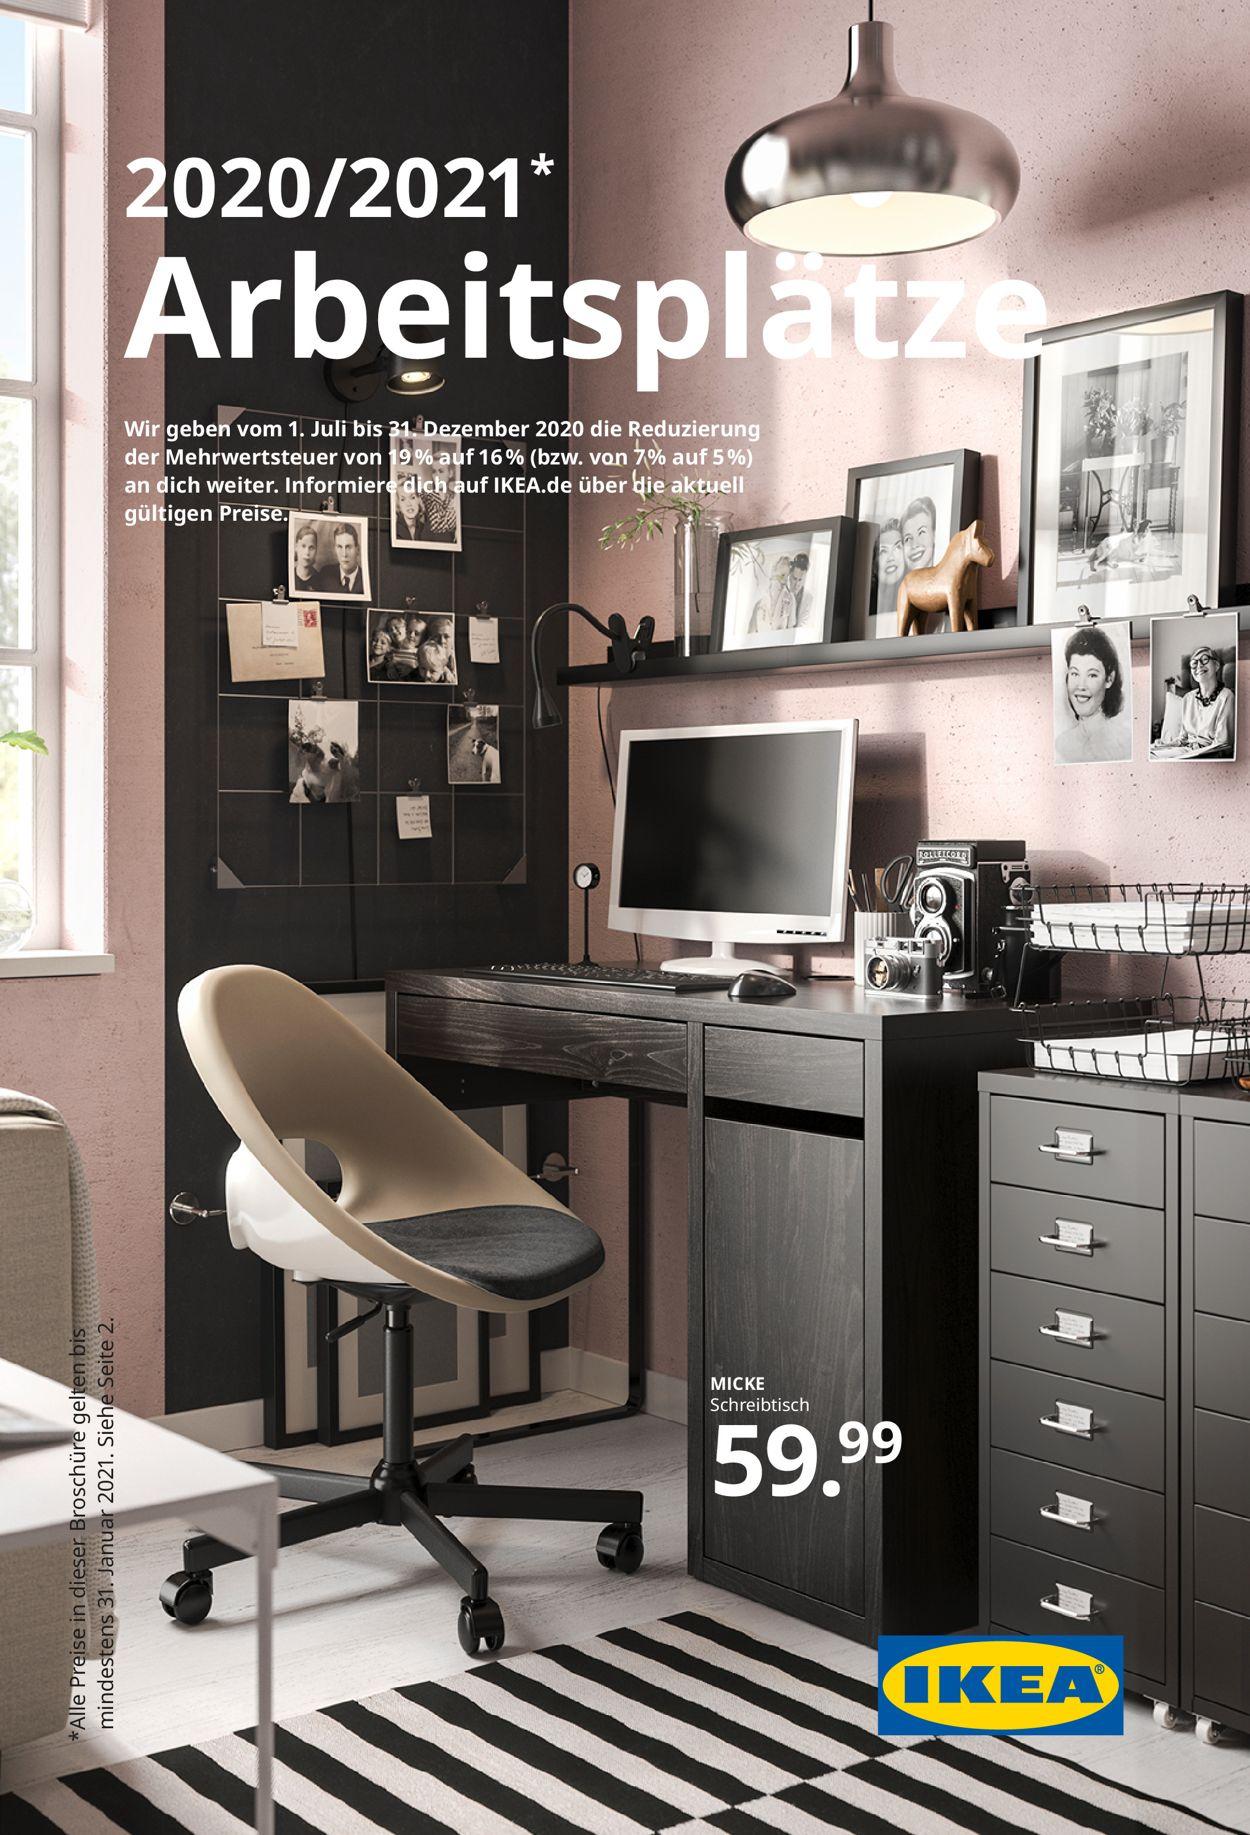 IKEA Prospekt - Aktuell vom 01.07-31.12.2020